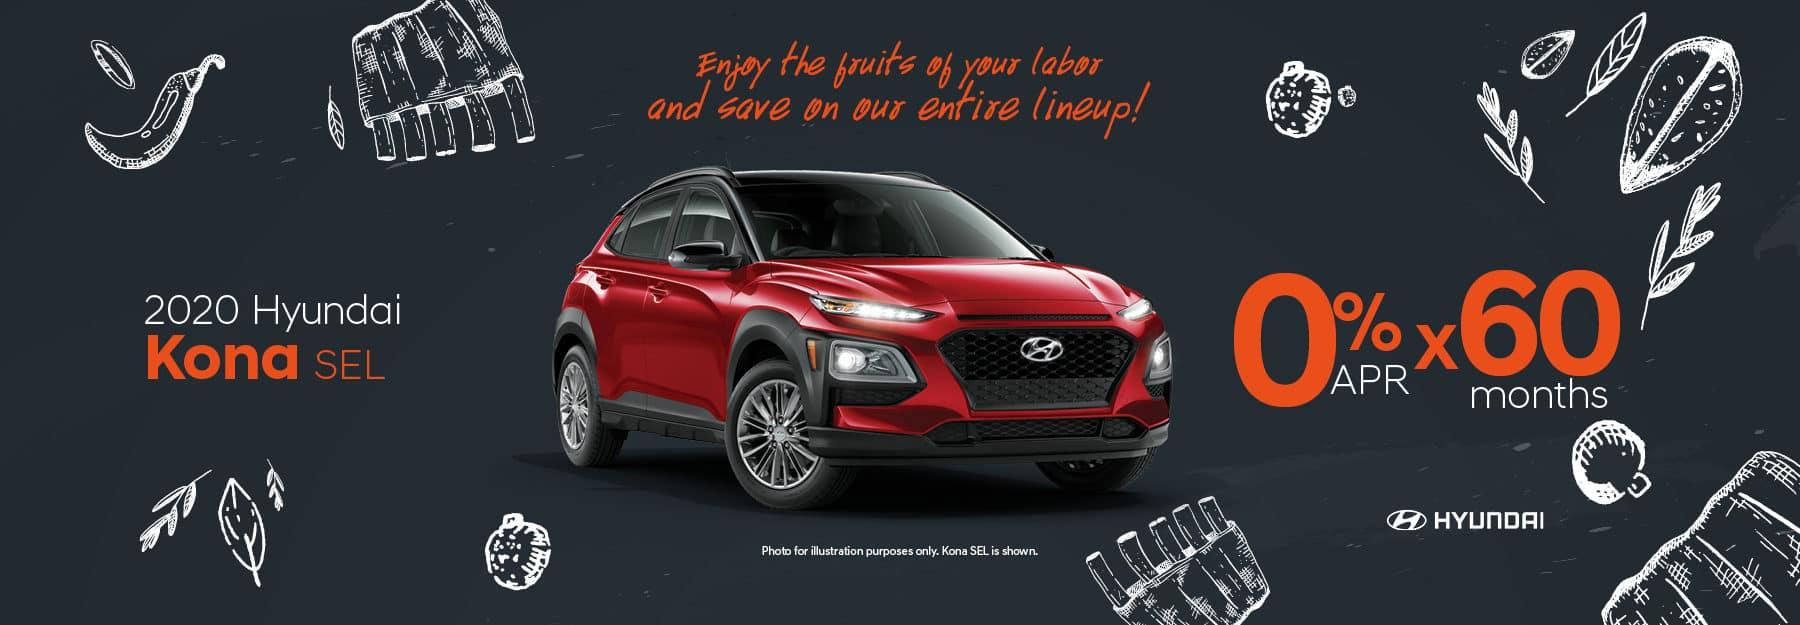 0% APR for 60 months on 2020 Hyundai Kona SEL